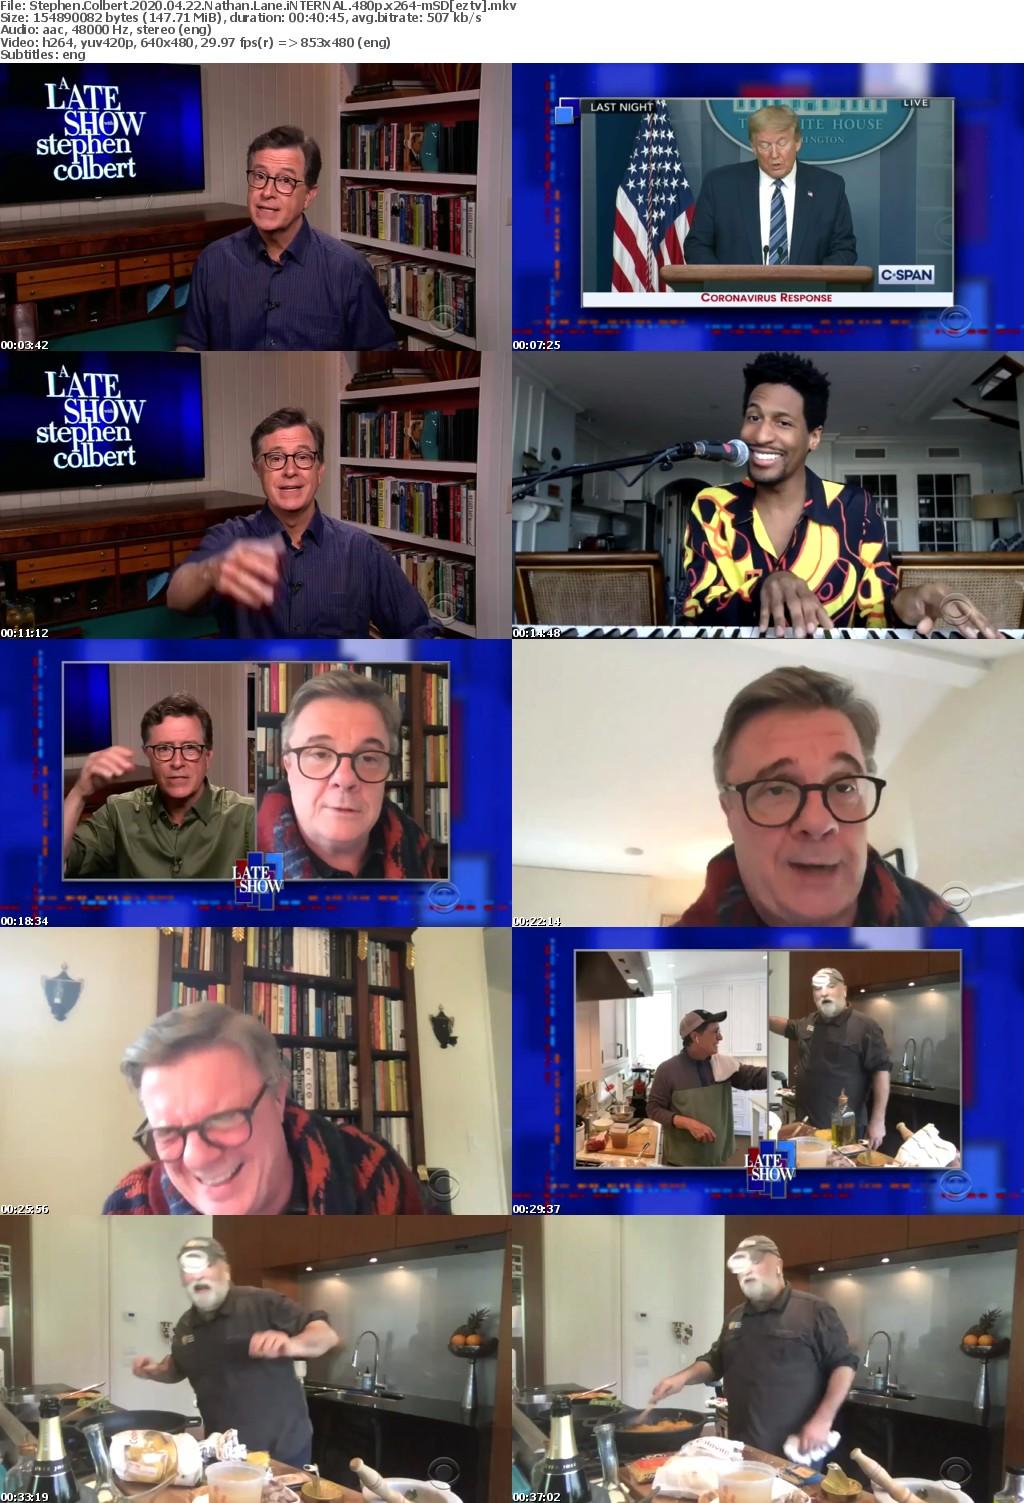 Stephen Colbert 2020 04 22 Nathan Lane iNTERNAL 480p x264-mSD